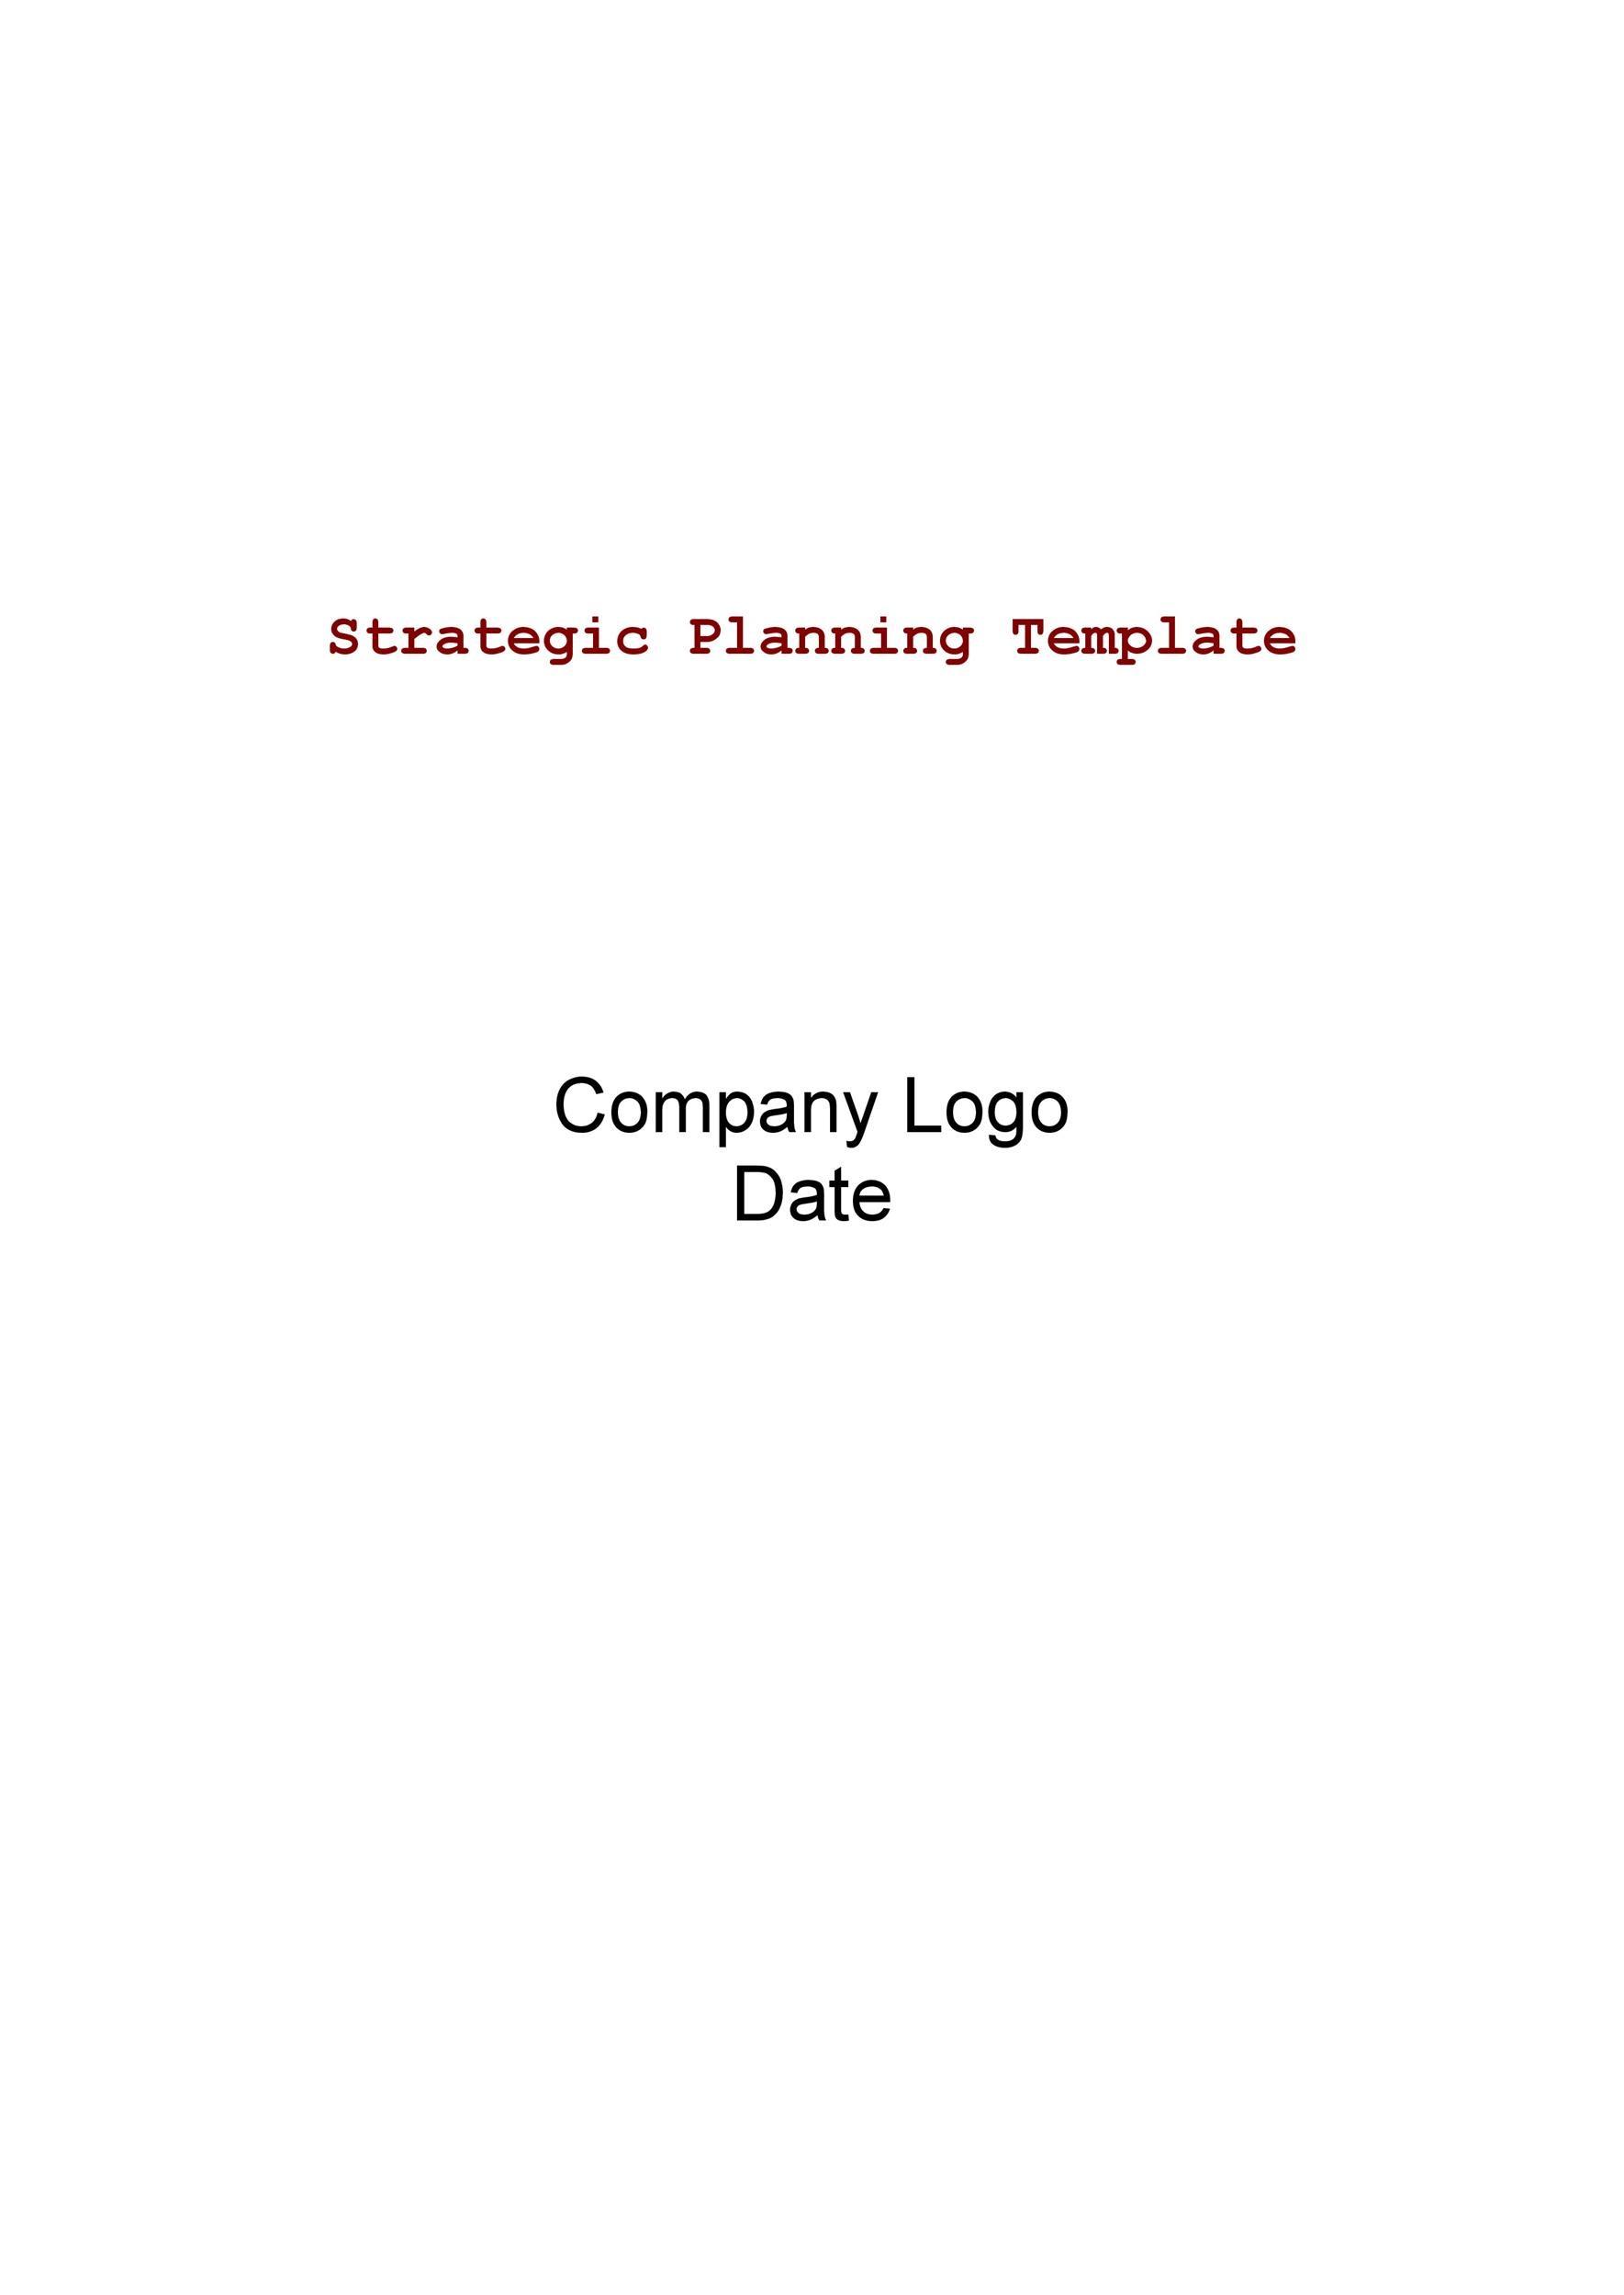 Free Strategic Plan Template 07